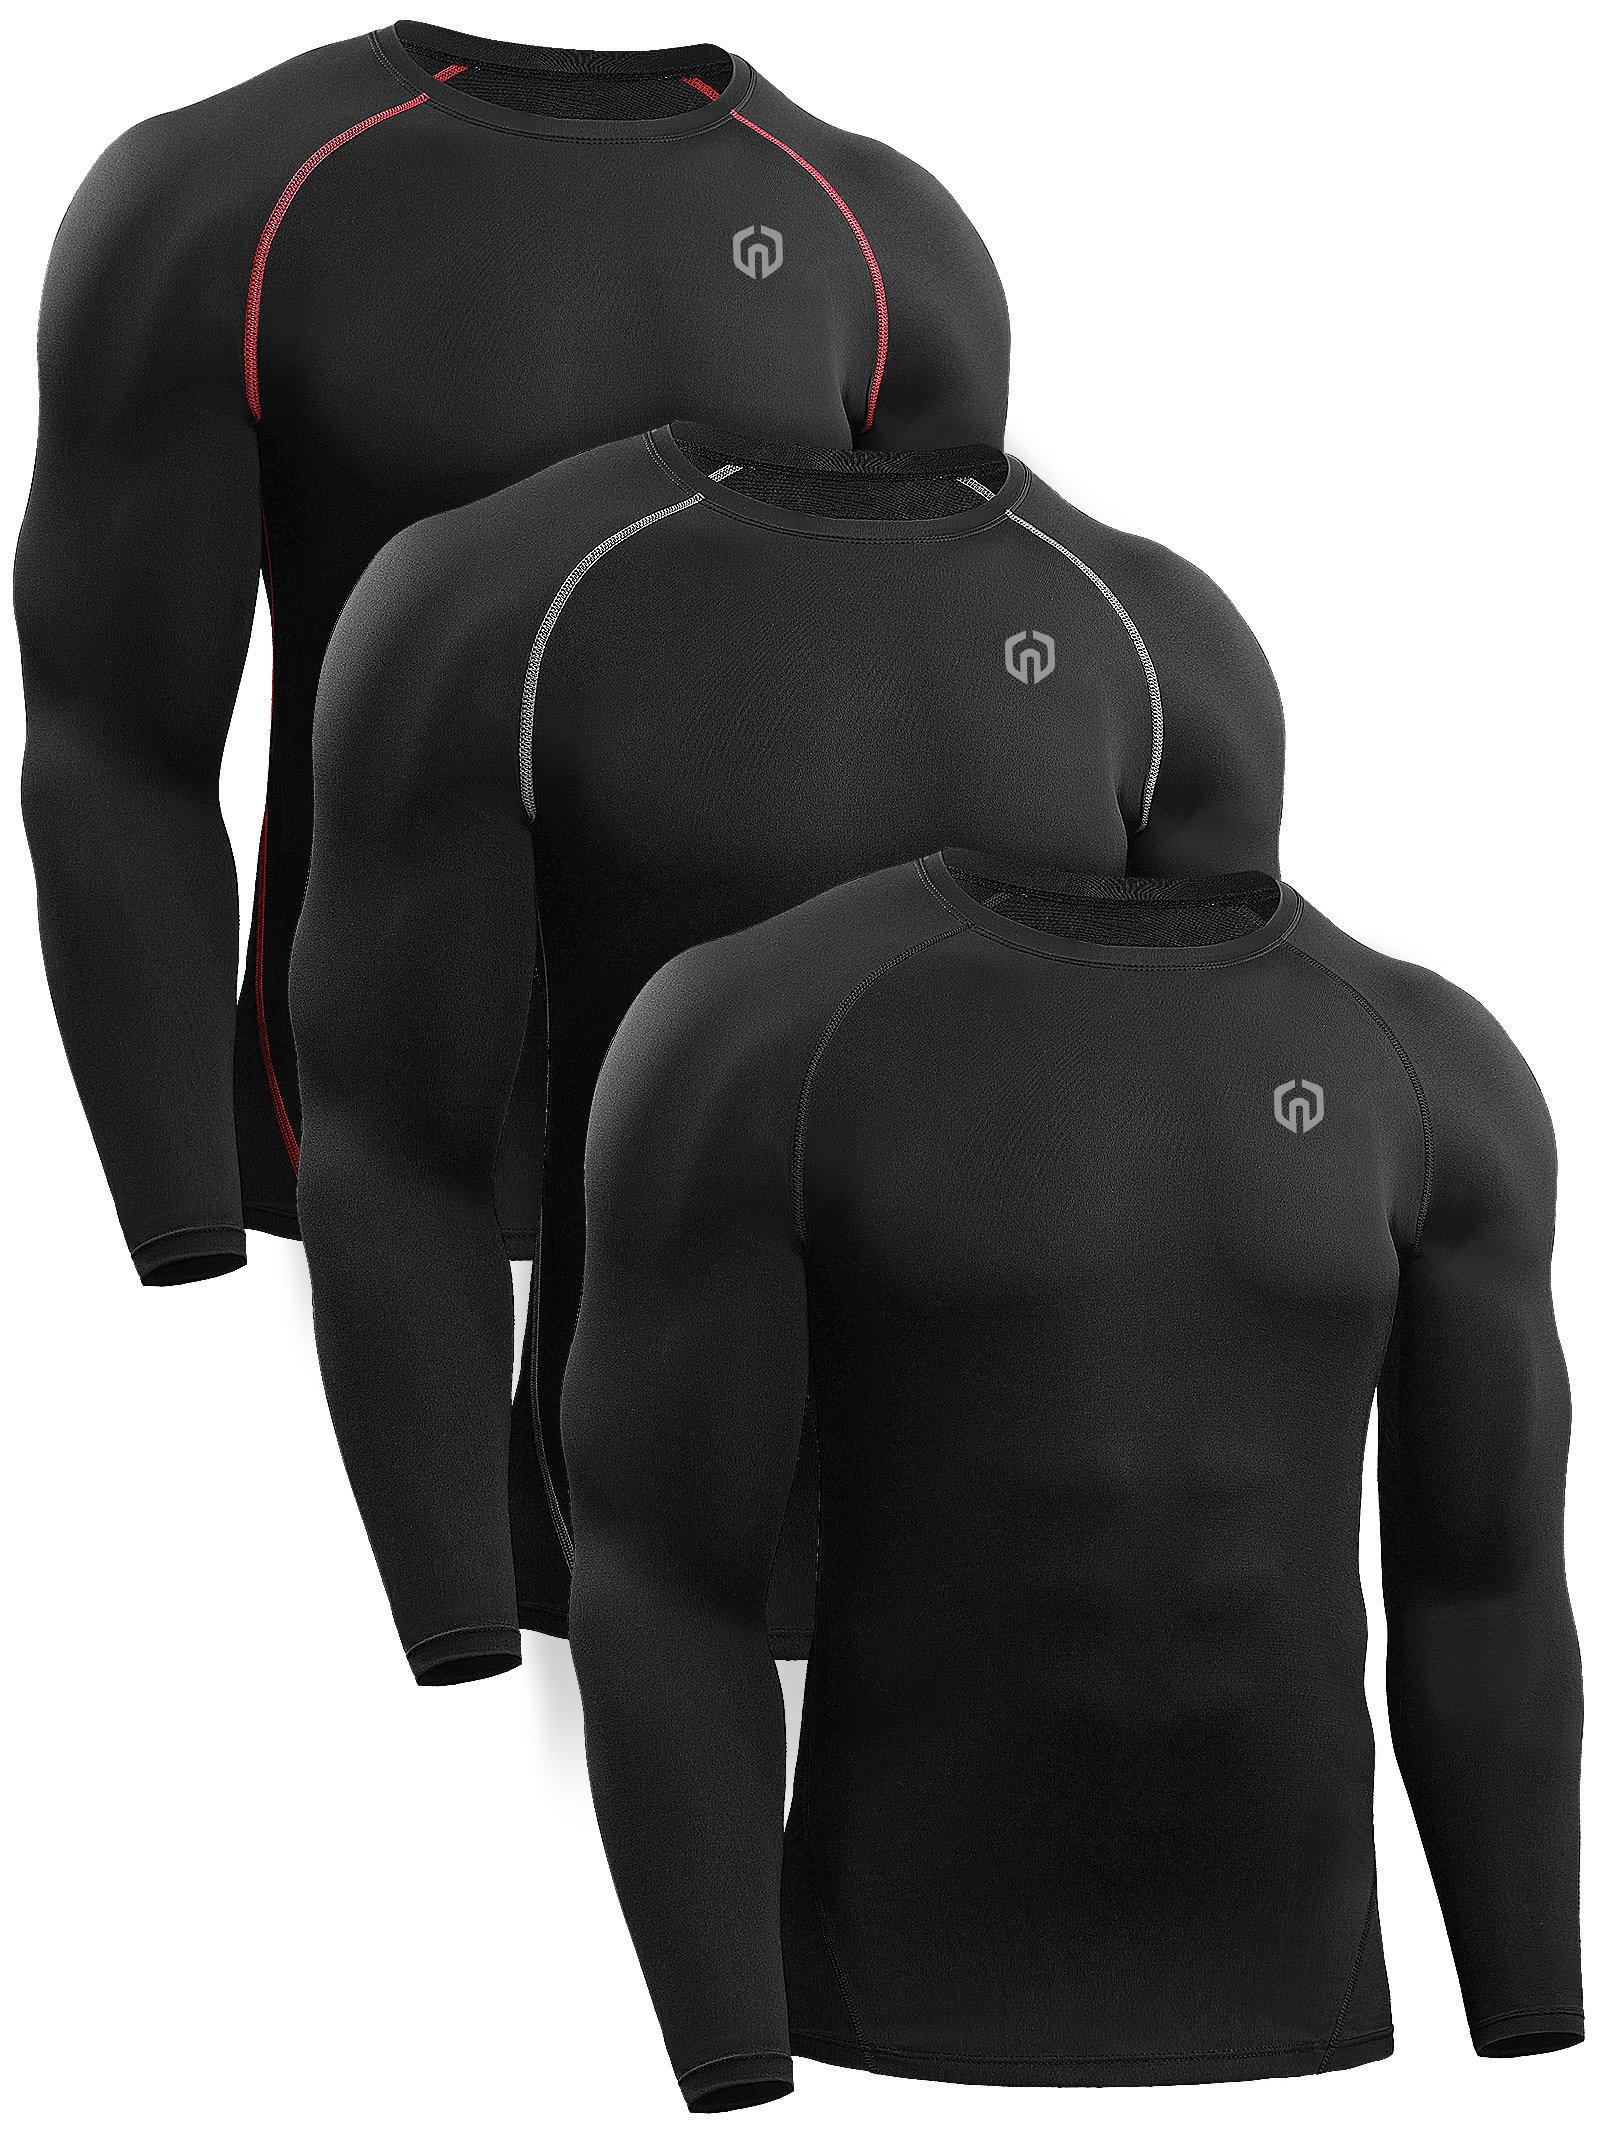 Neleus Men's 3 Pack Workout Compression Long Sleeve Shirts,5035,Black,Black(Grey),Black(Red),US S,EU M